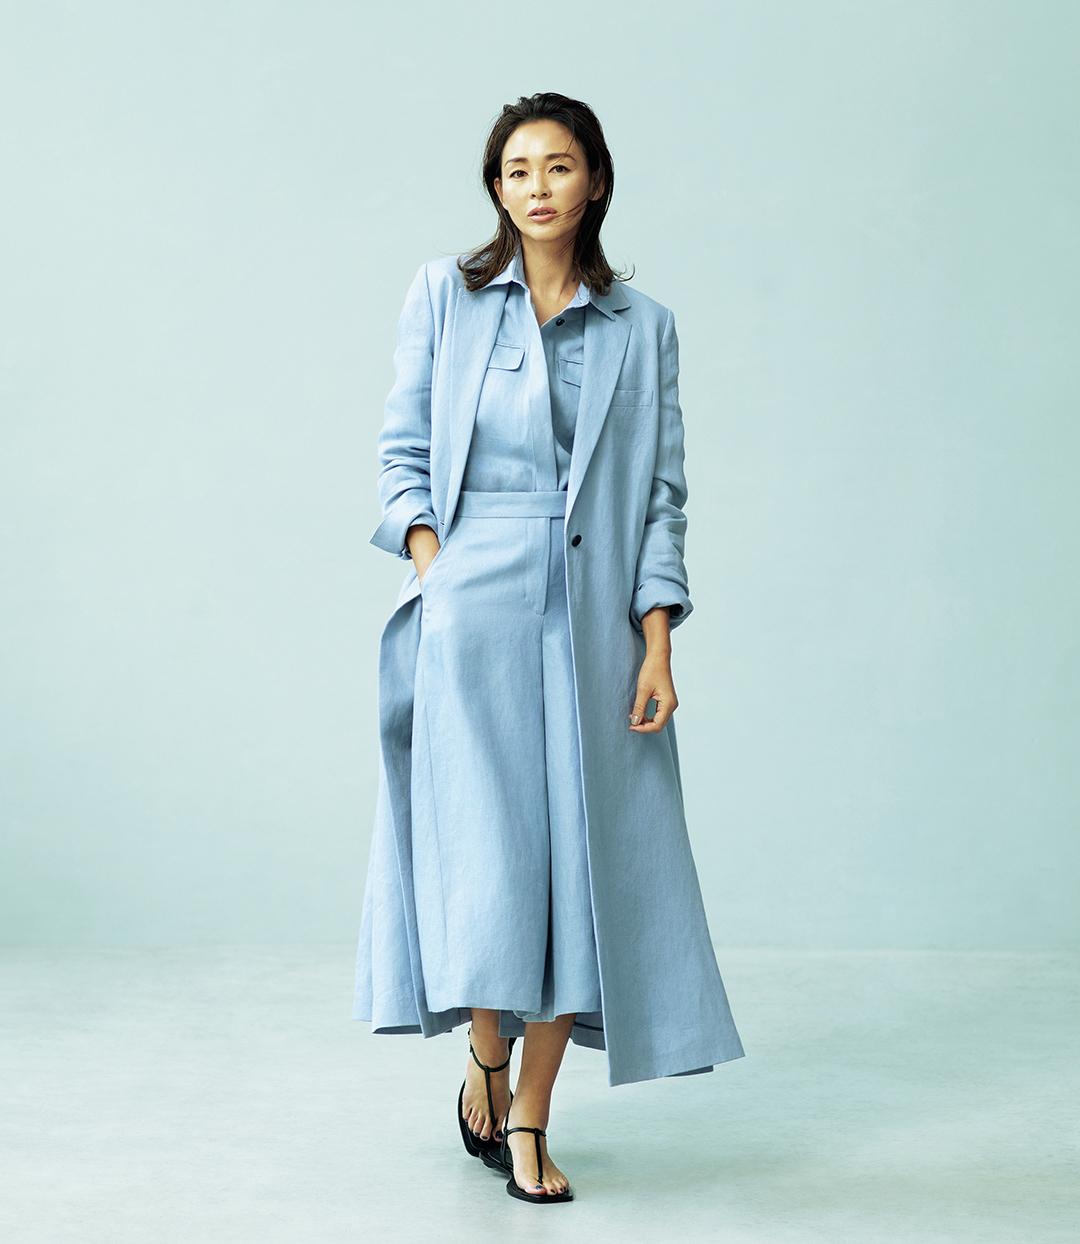 SHIHOが着るebureの自然体で着映える服_1